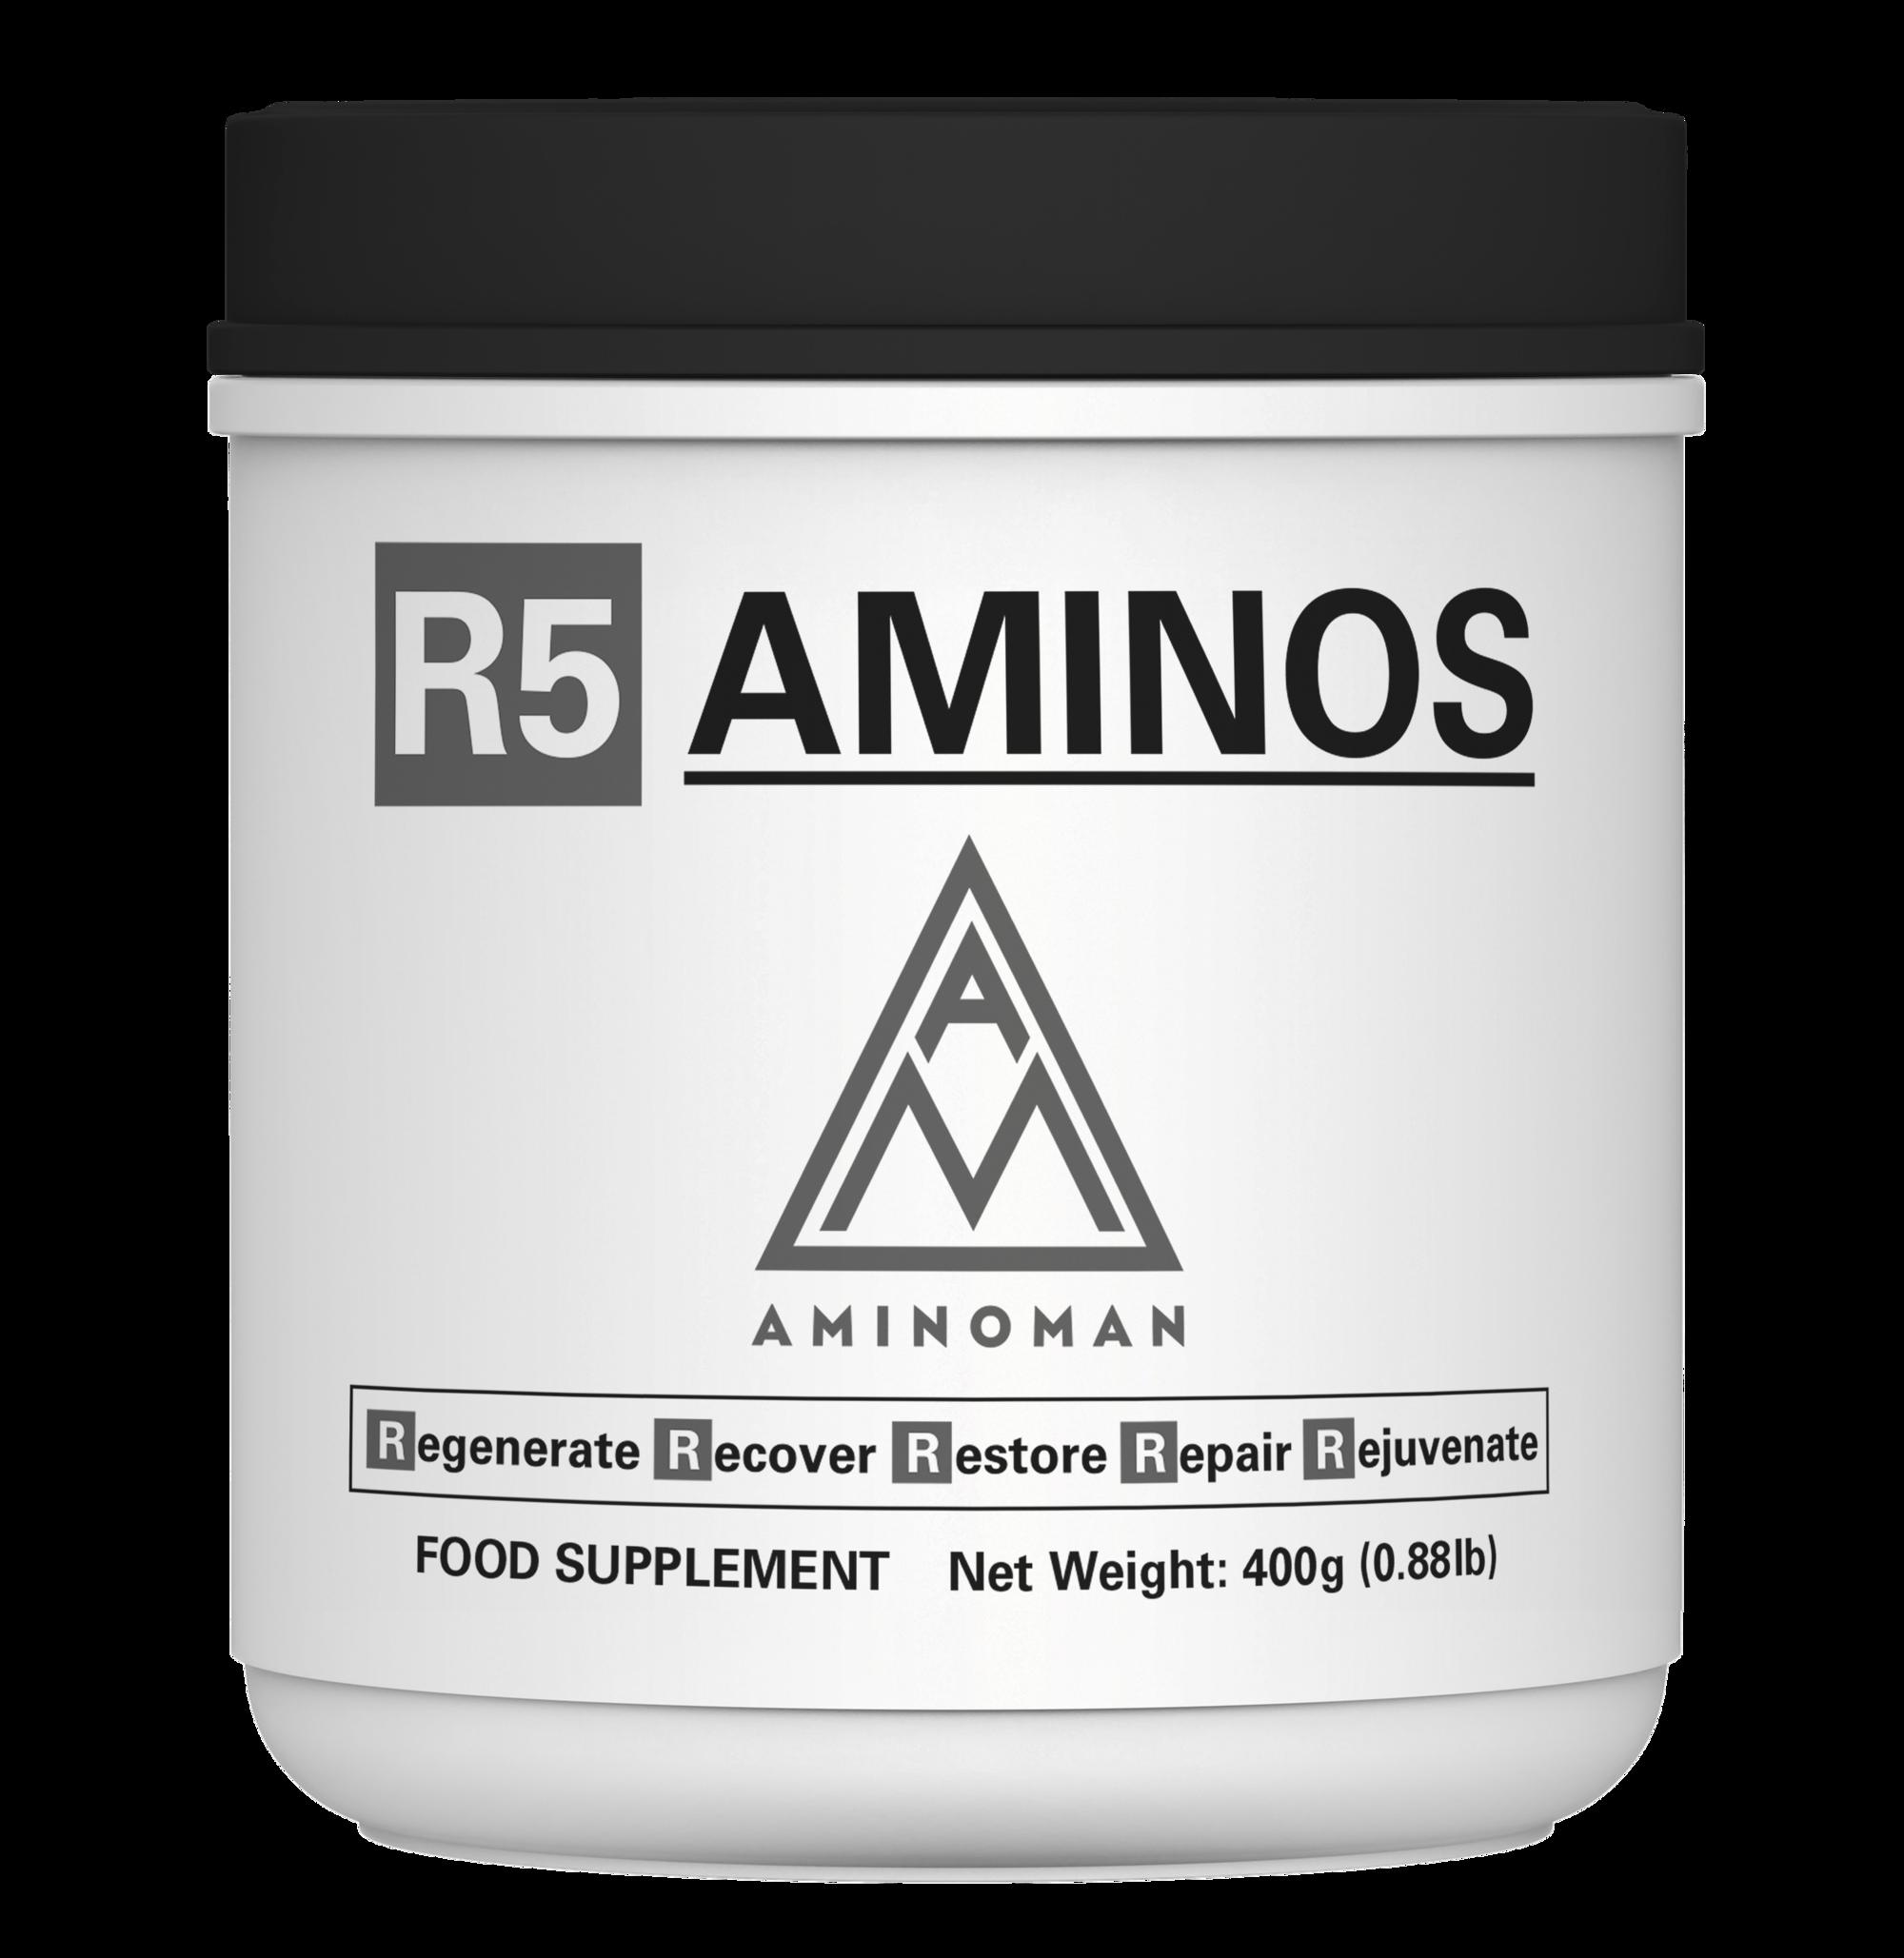 CLAIM YOUR FREE R5 AMINOS